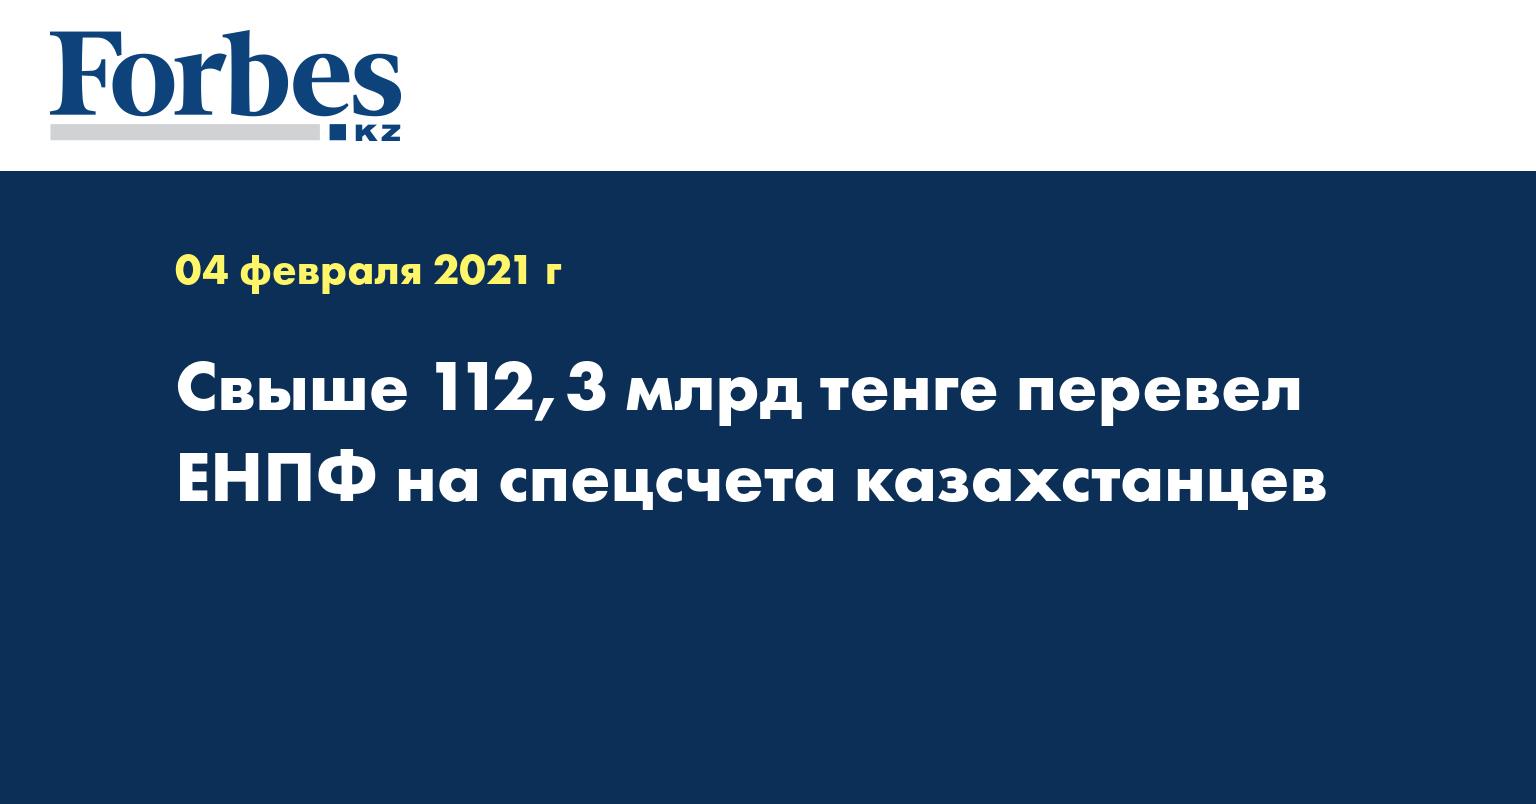 Свыше 112,3 млрд тенге перевел ЕНПФ на спецсчета казахстанцев